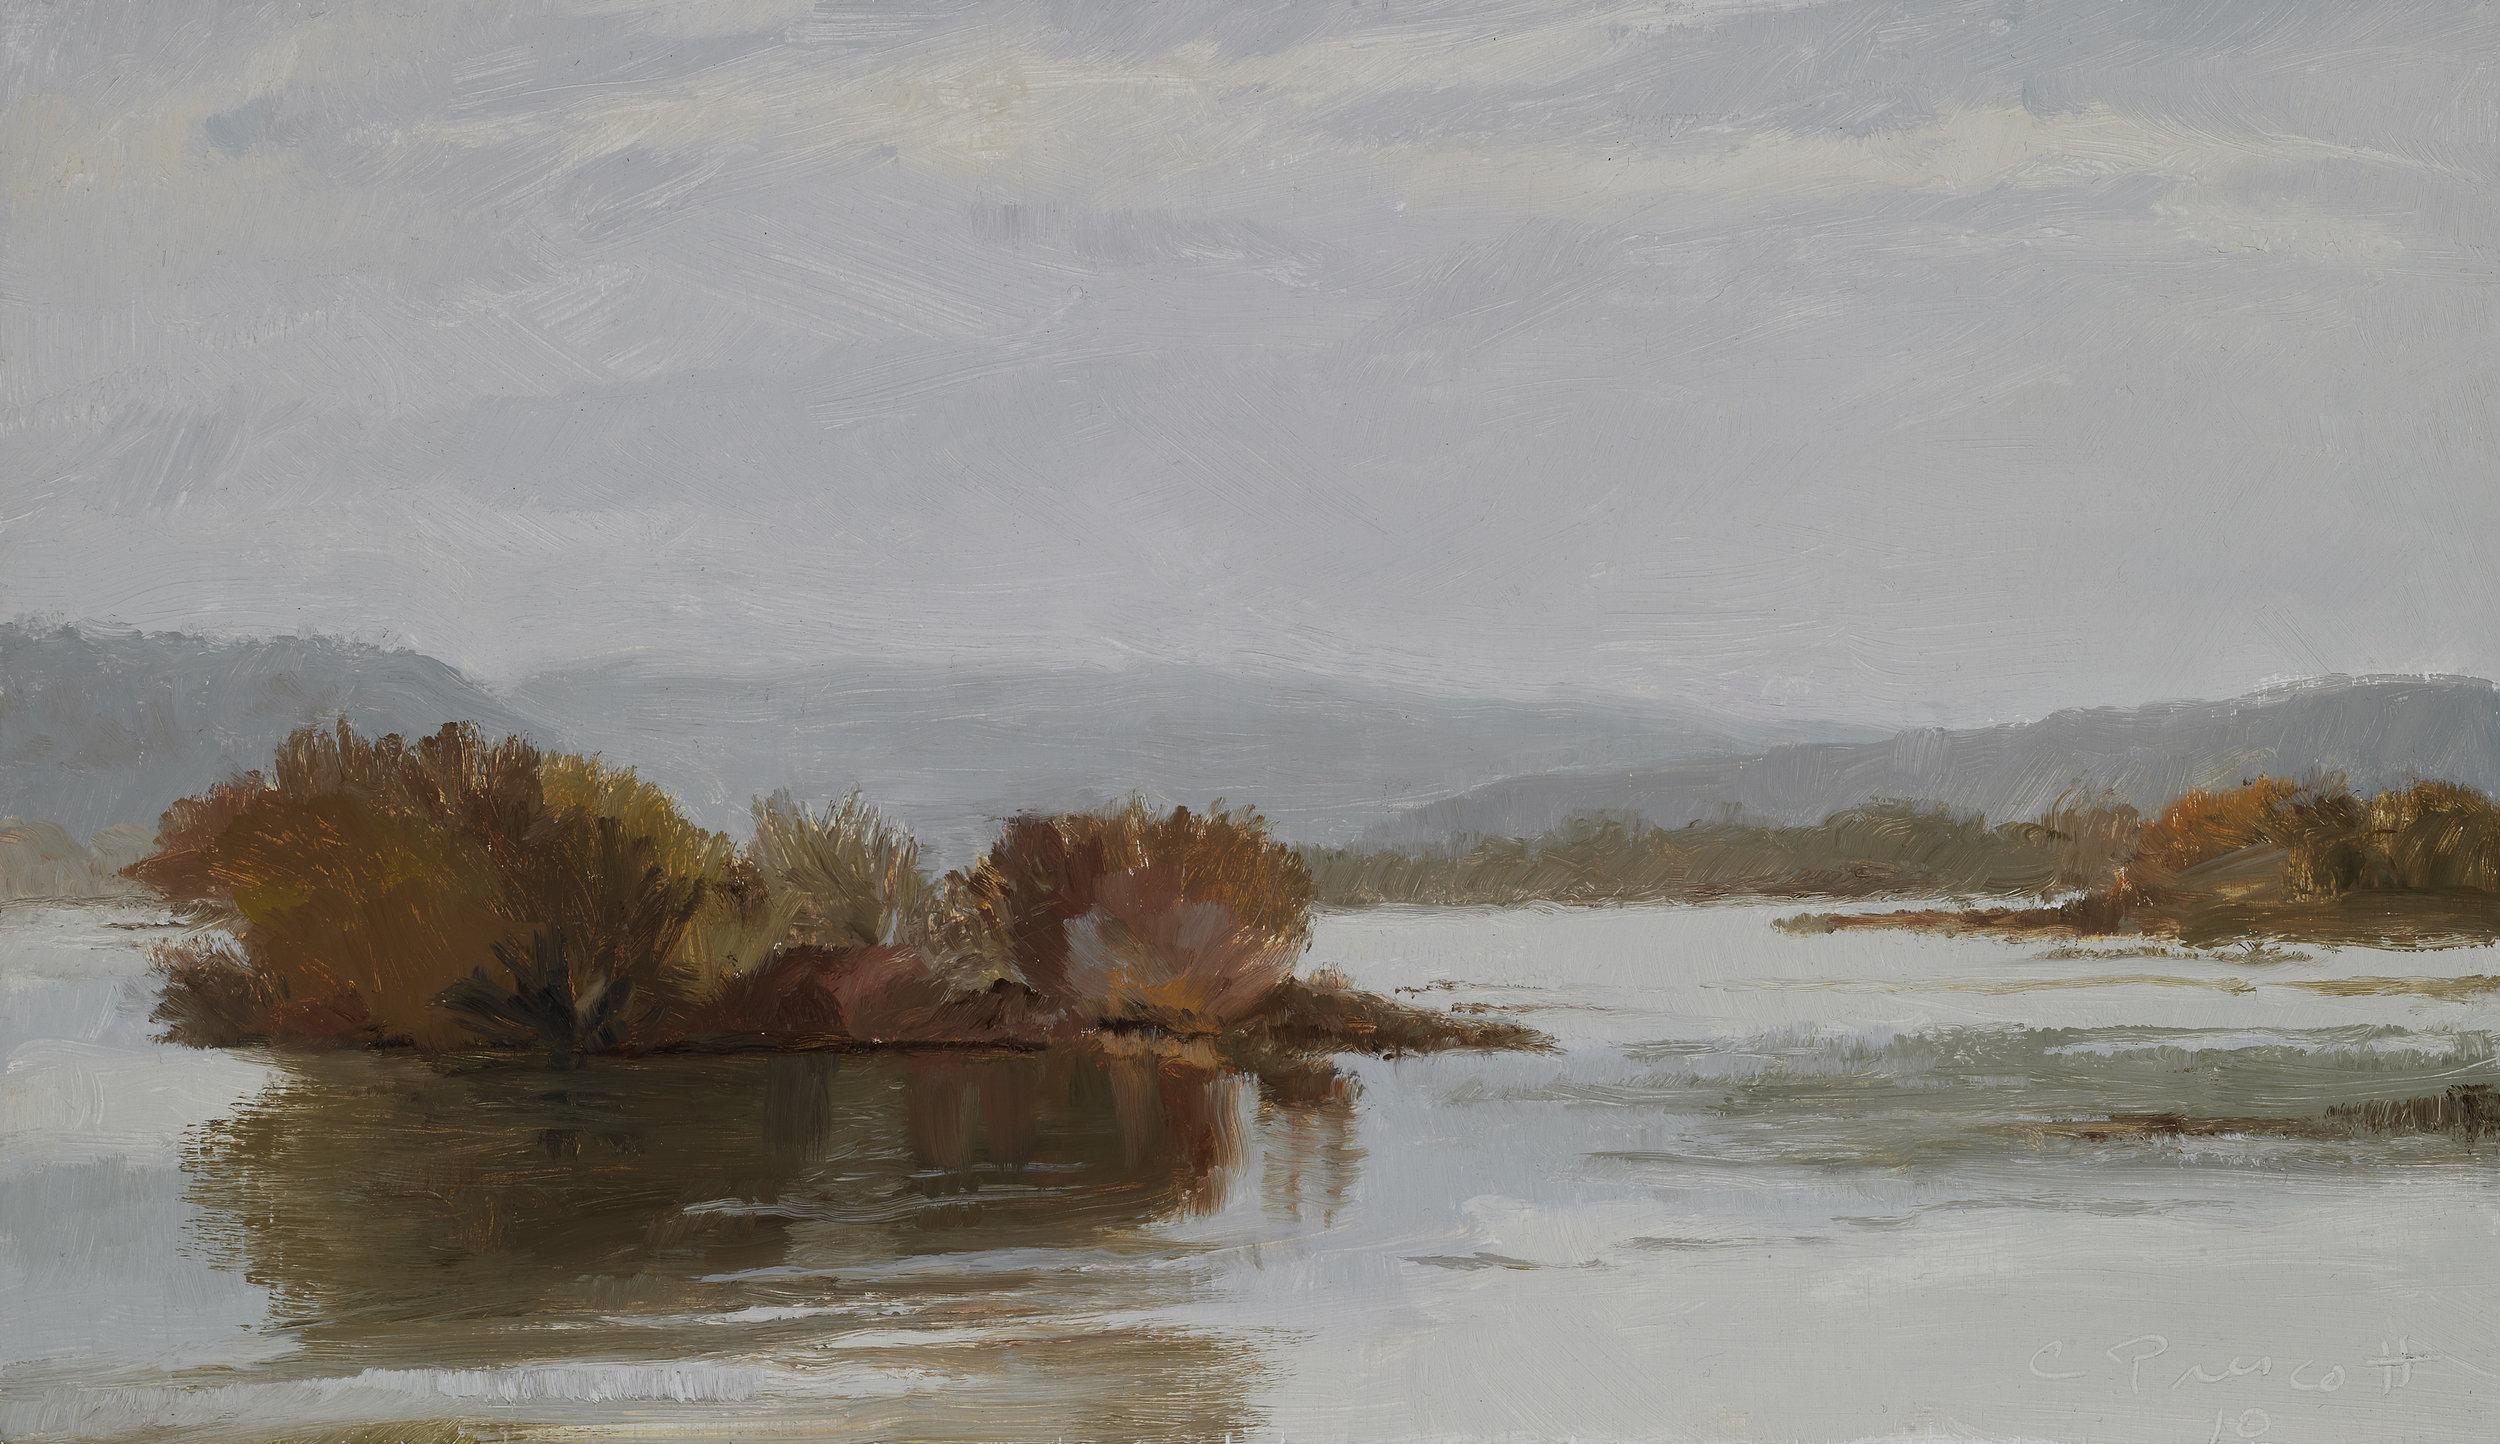 "Susquehanna River , Oil on Wood Panel, 2010, 8 1/4"" x 14 1/4"""